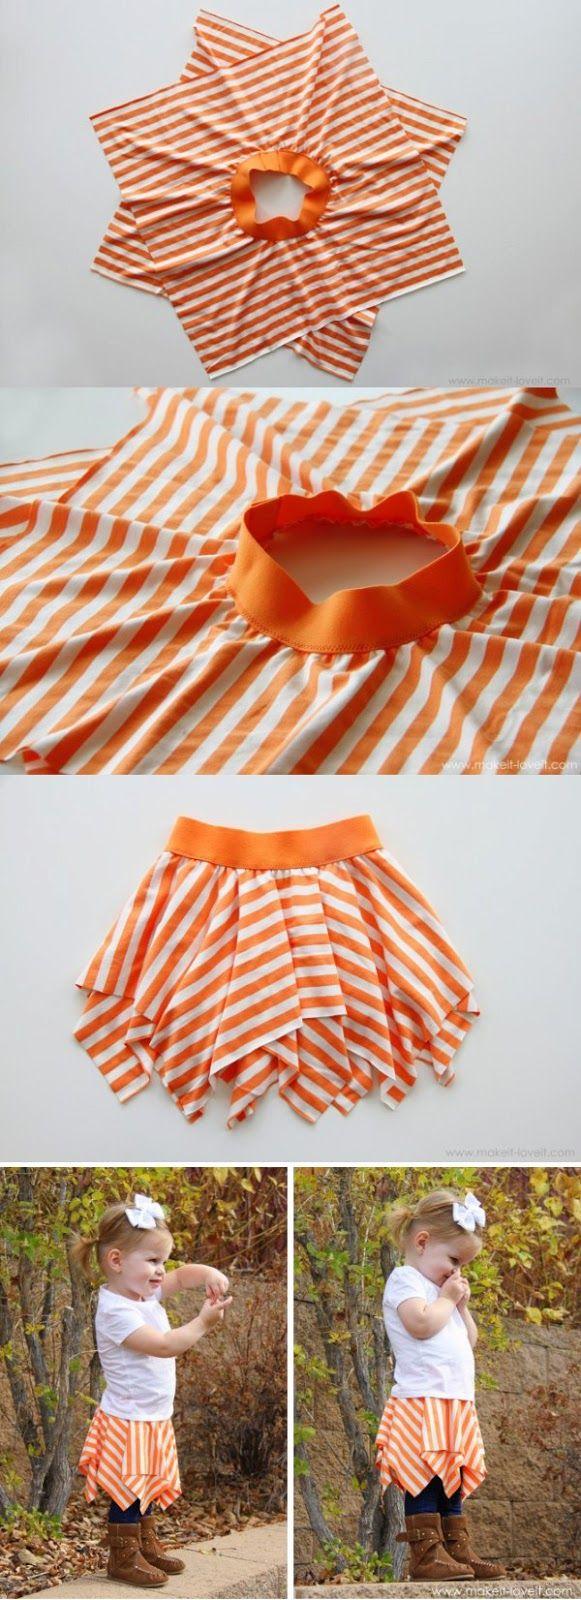 Square circle skirt